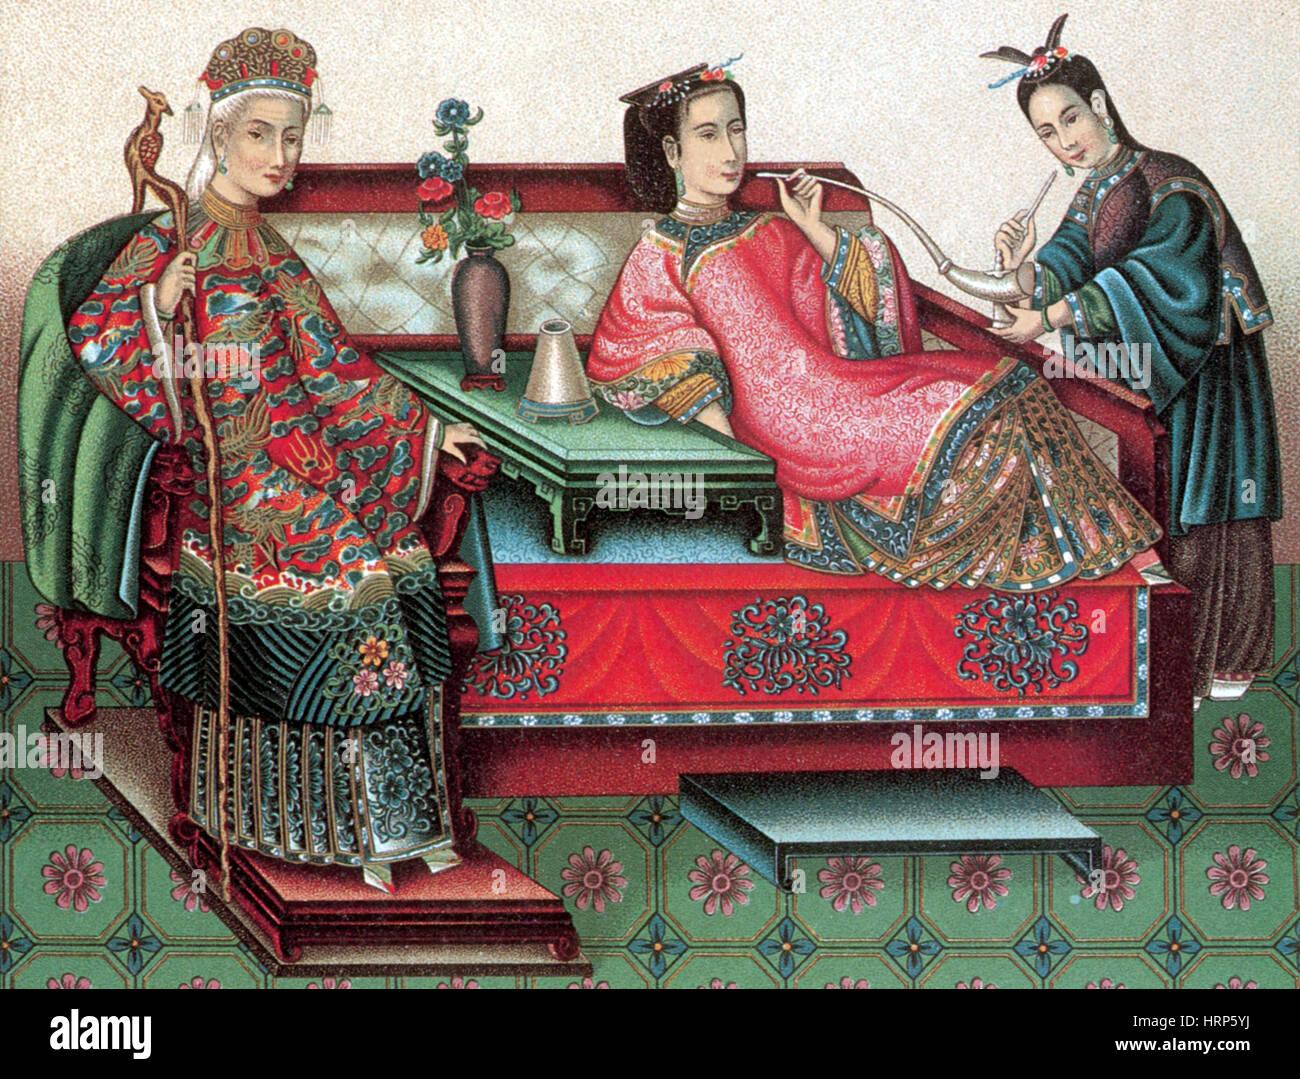 Chinese Empress Smoking Opium, 19th Century - Stock Image